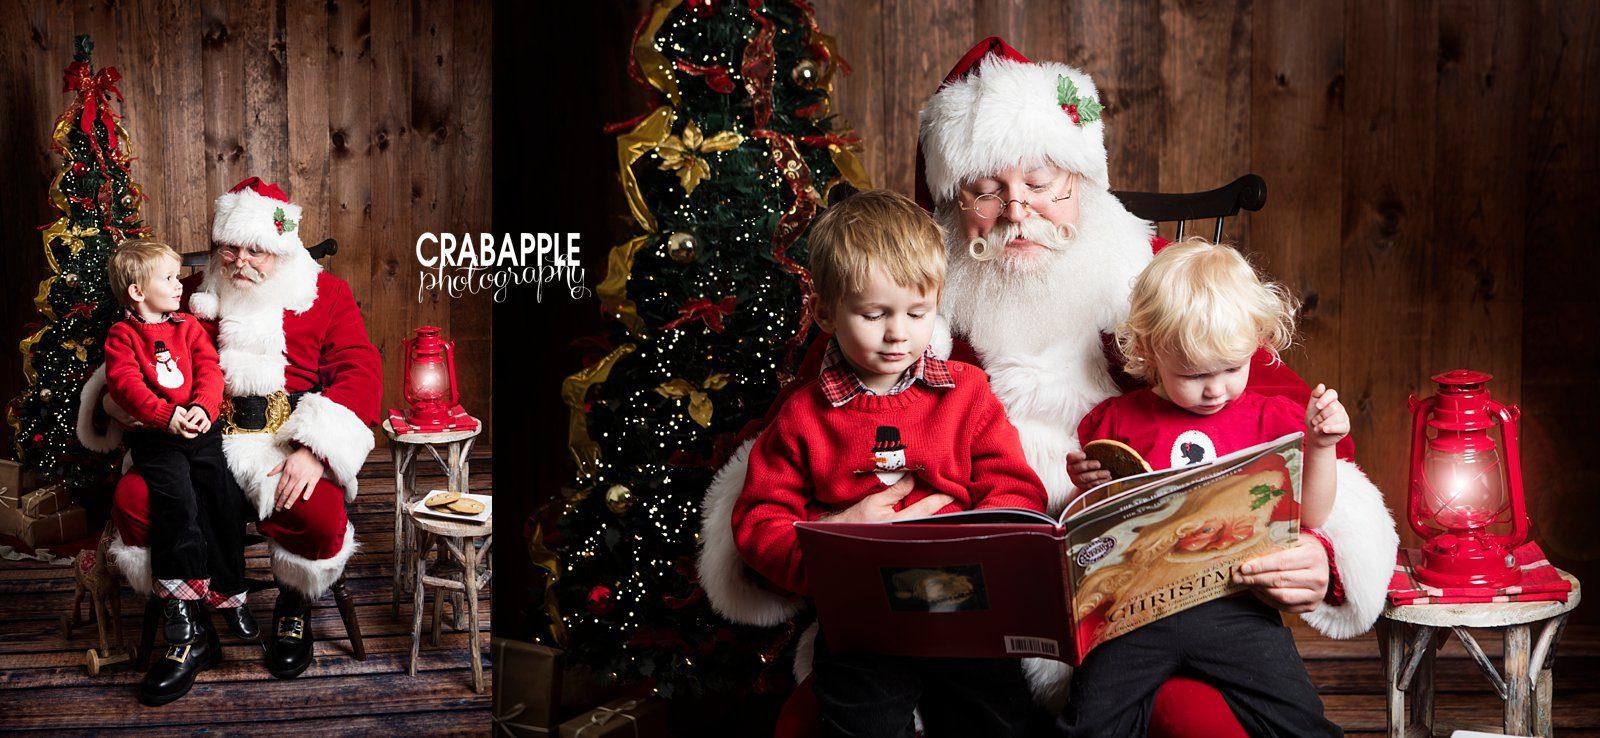 Childrens Christmas Portraits Ideas MA Crabapple Photography